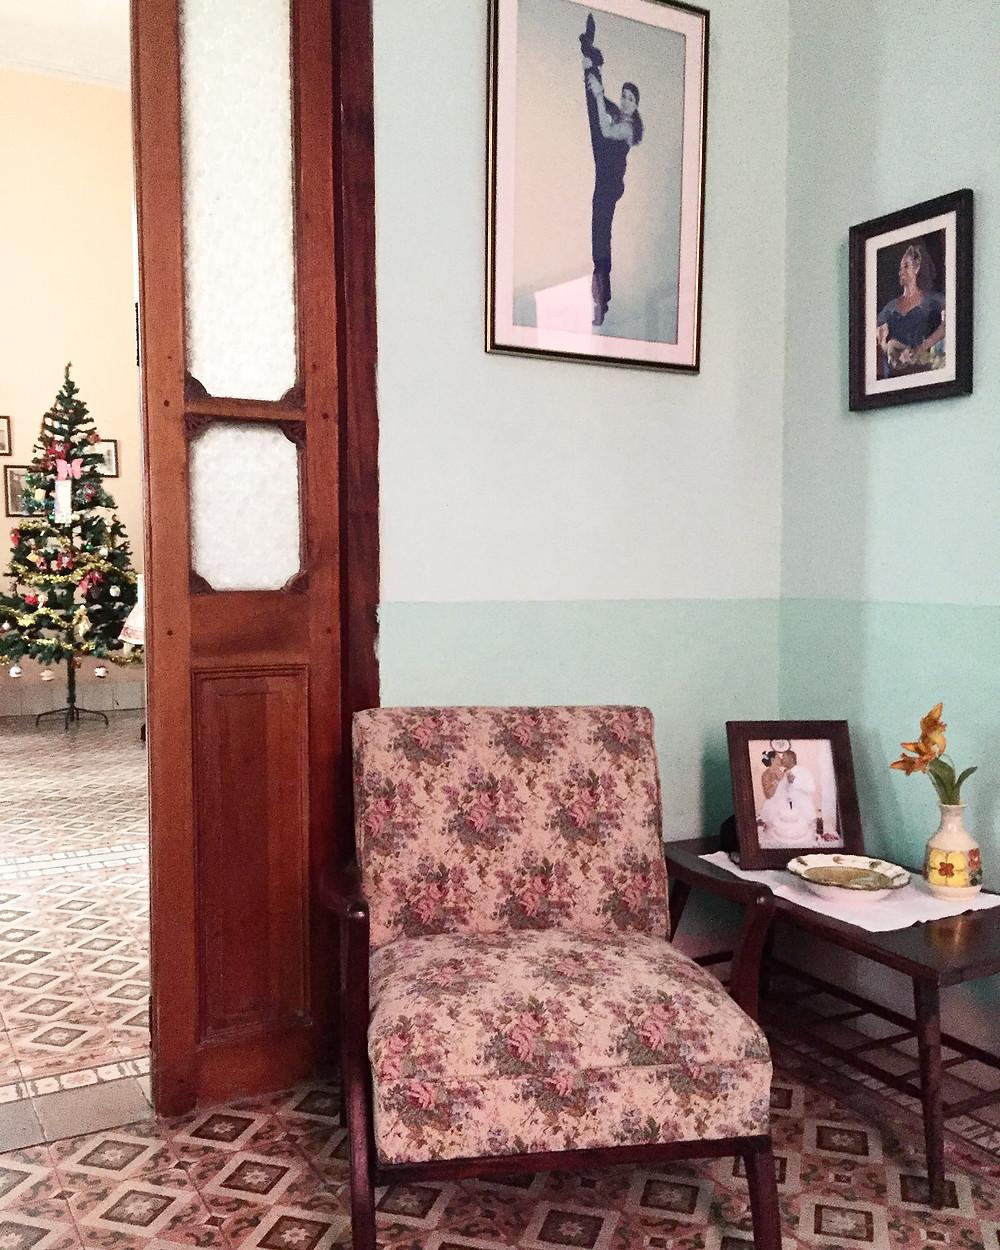 Casa particular in Havana, Cuba